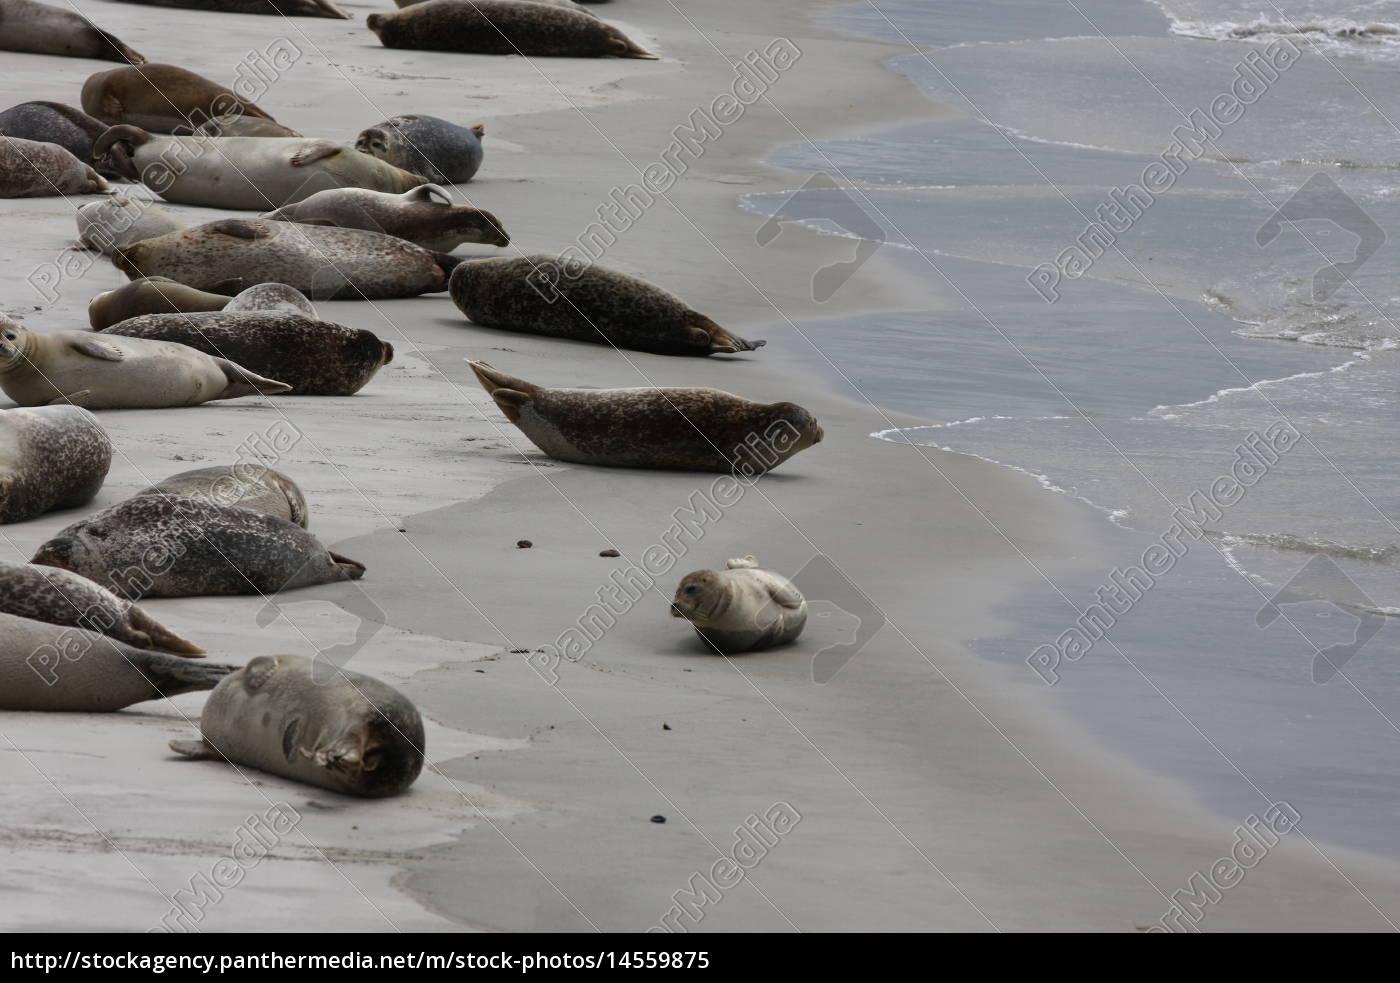 Düne, Helgoland, Kegelrobben, Robben, Säugetier, Wasser - 14559875